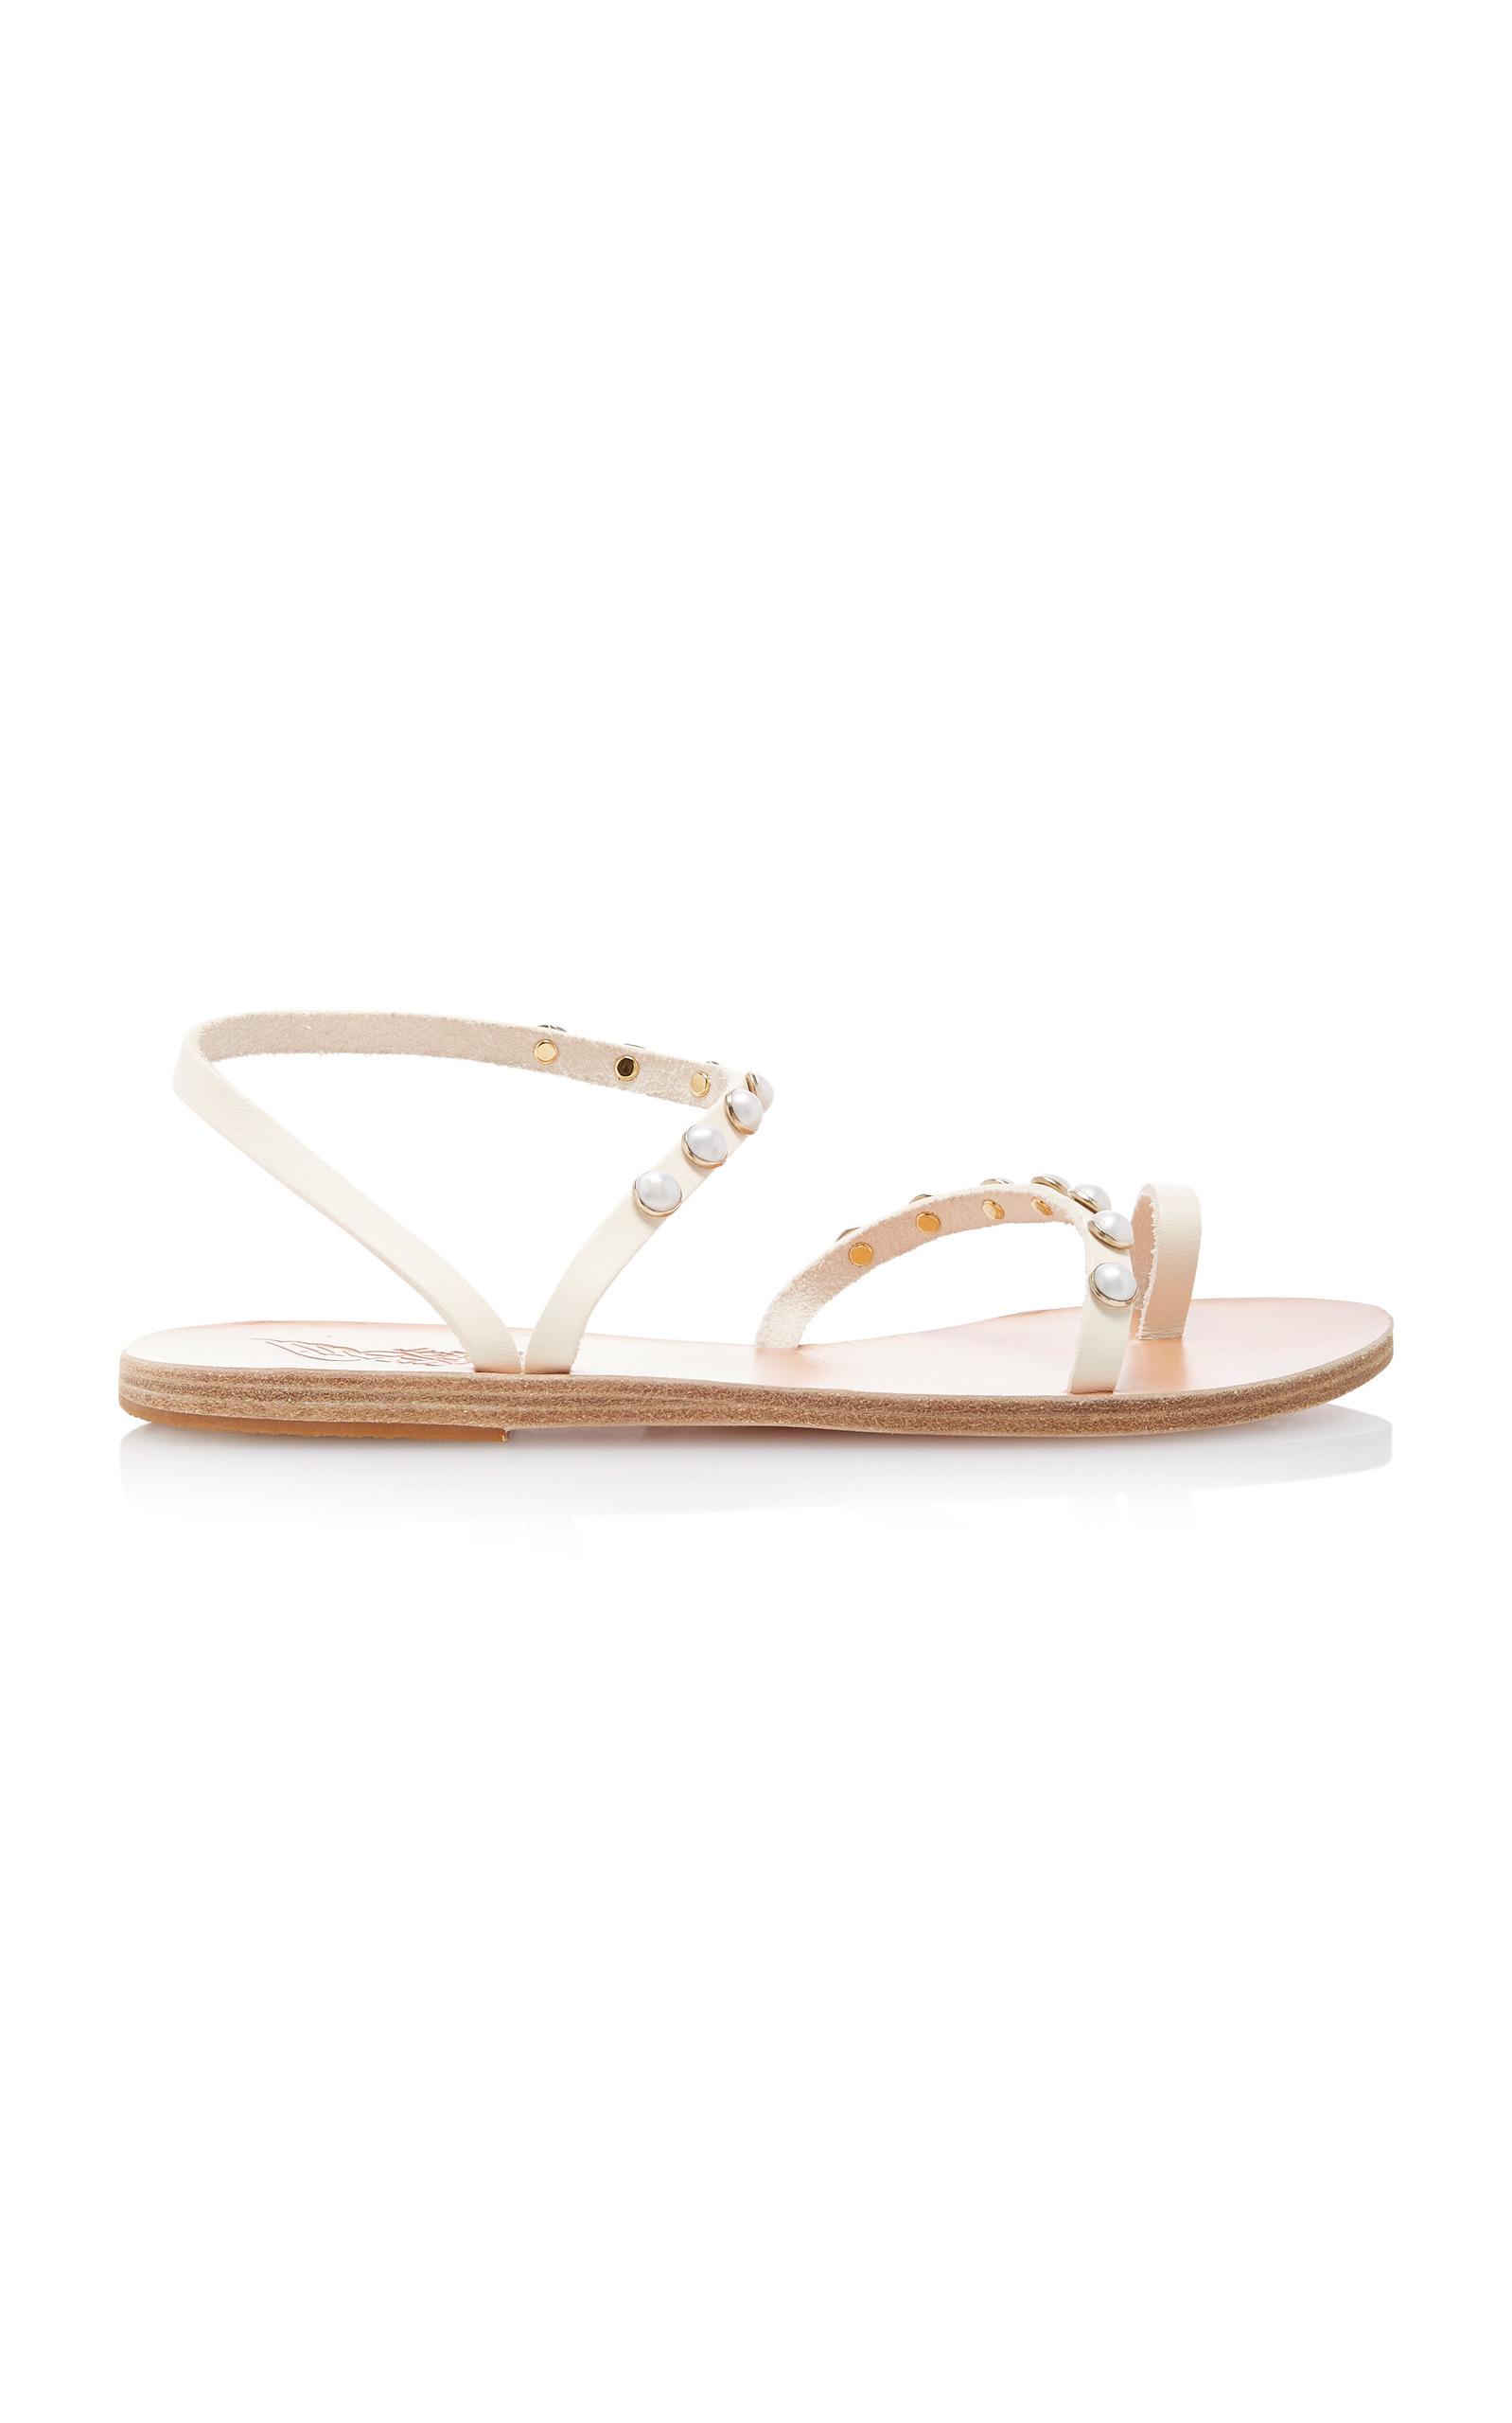 d2e18583e Ancient Greek SandalsApli Eleftheria Pearl Sandal. CLOSE. Loading. Loading.  Loading